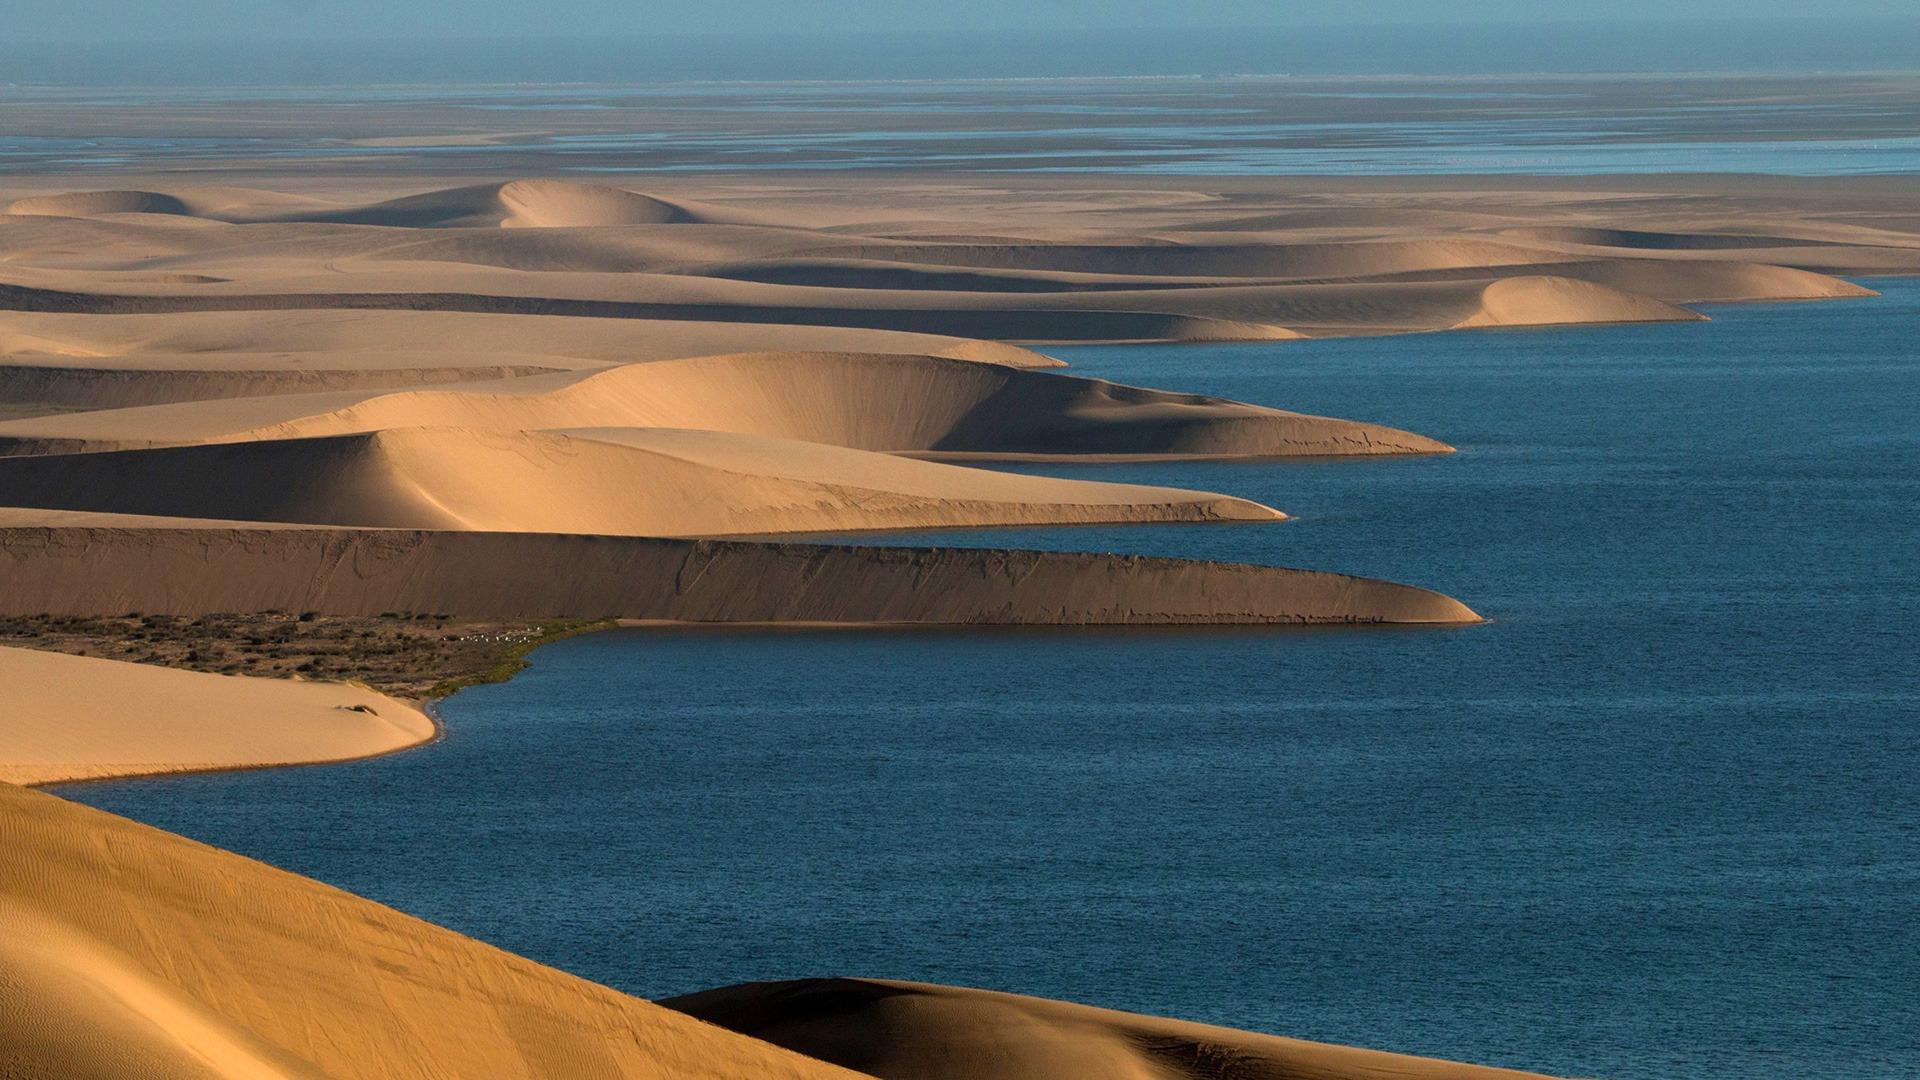 Aerial of dunes meeting the sea on the Skeleton Coast, Namibia